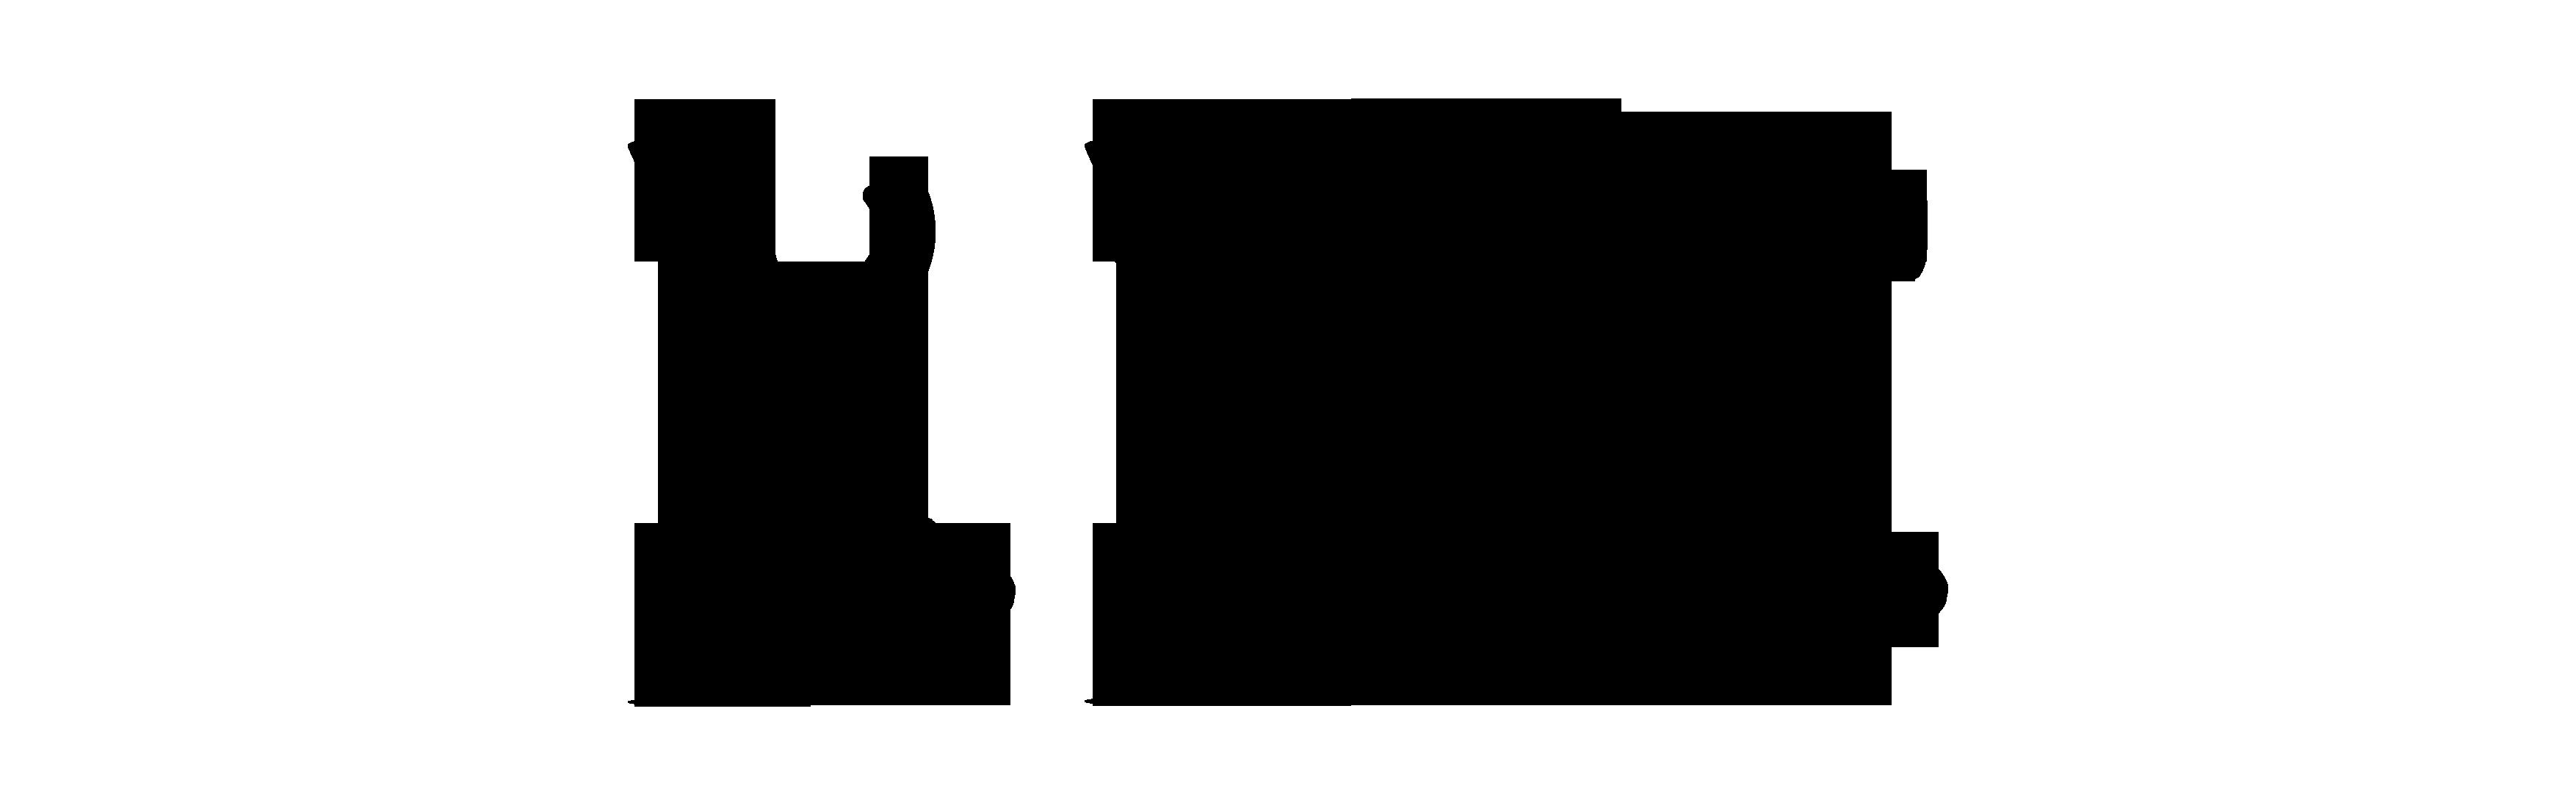 Padrin5